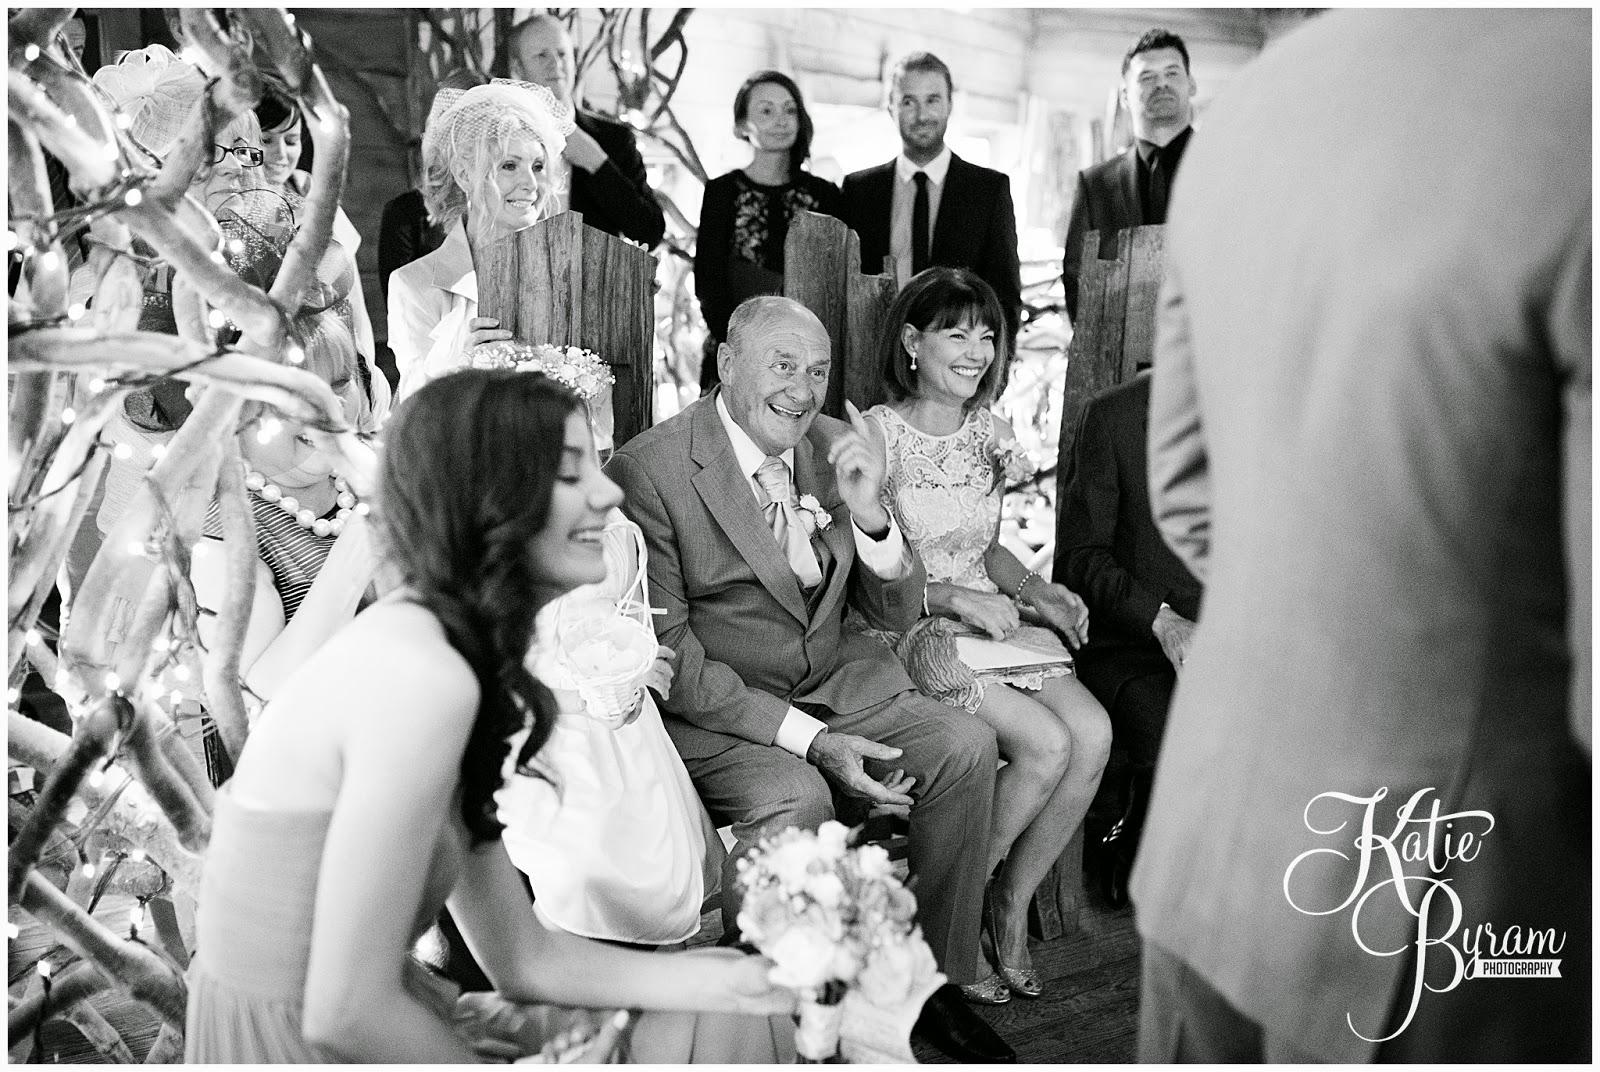 alnwick treehouse wedding, alnwick treehouse, treehouse wedding, alnwick gardens wedding, katie byram photography, lisa cameron hairdresser, dani.mua, unusual wedding venues, quirky wedding photography, northumberland wedding photography